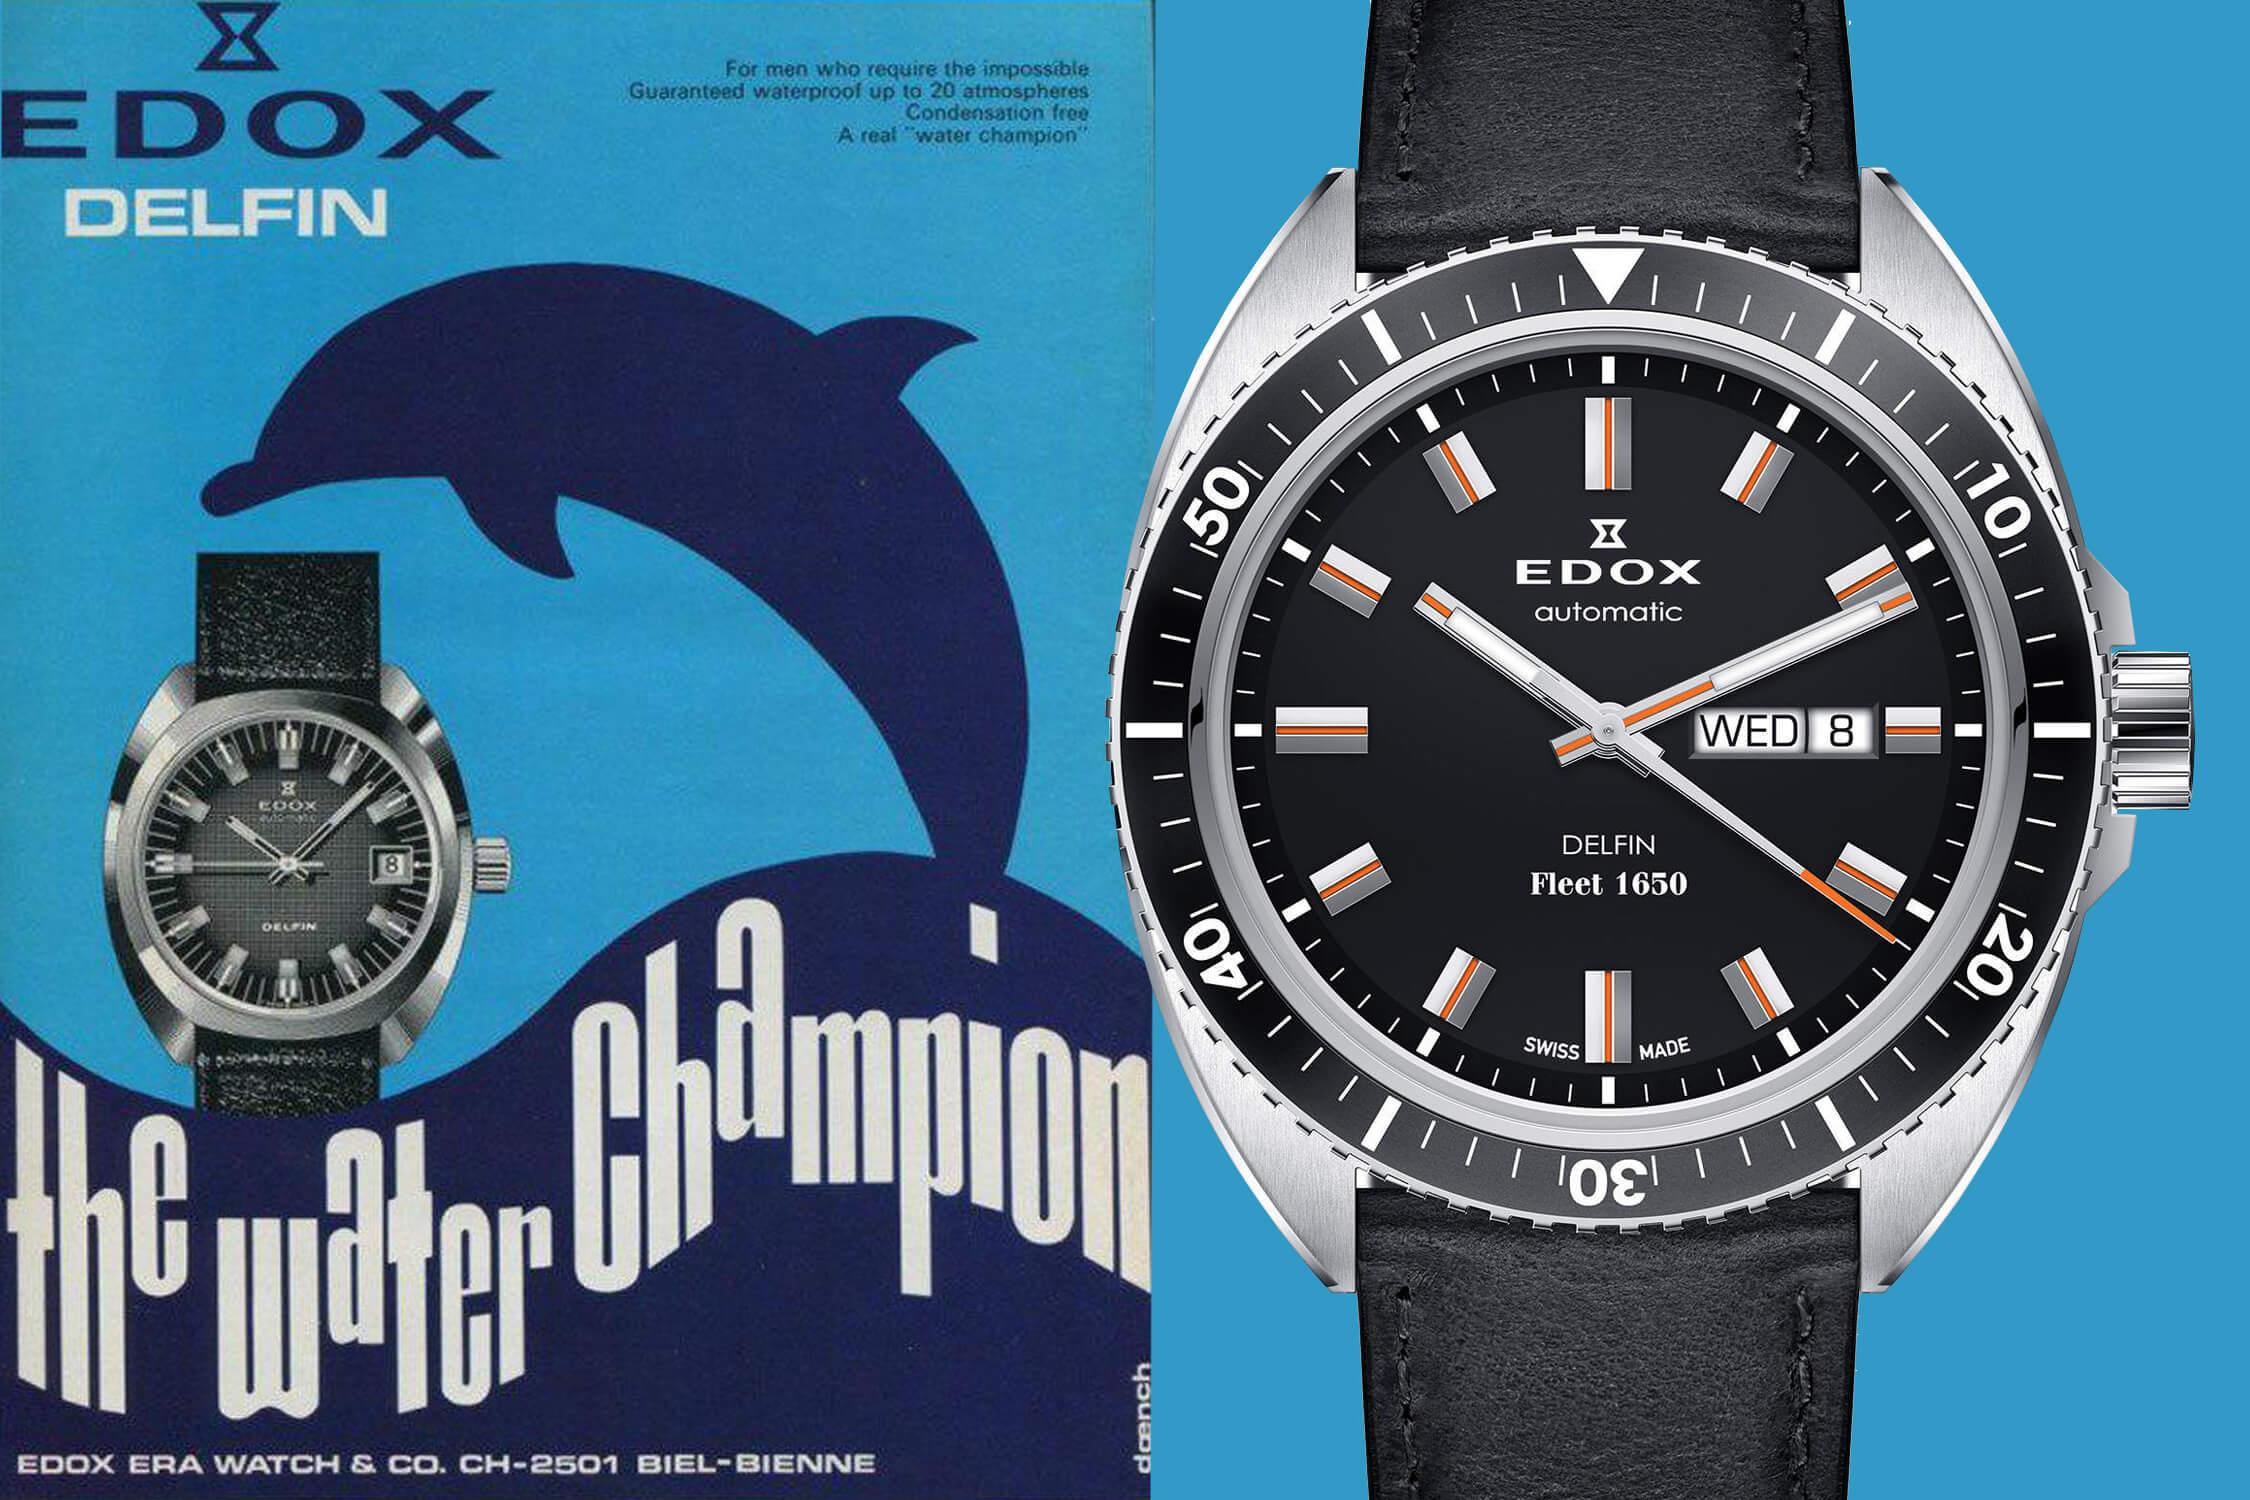 часы Edox delfin